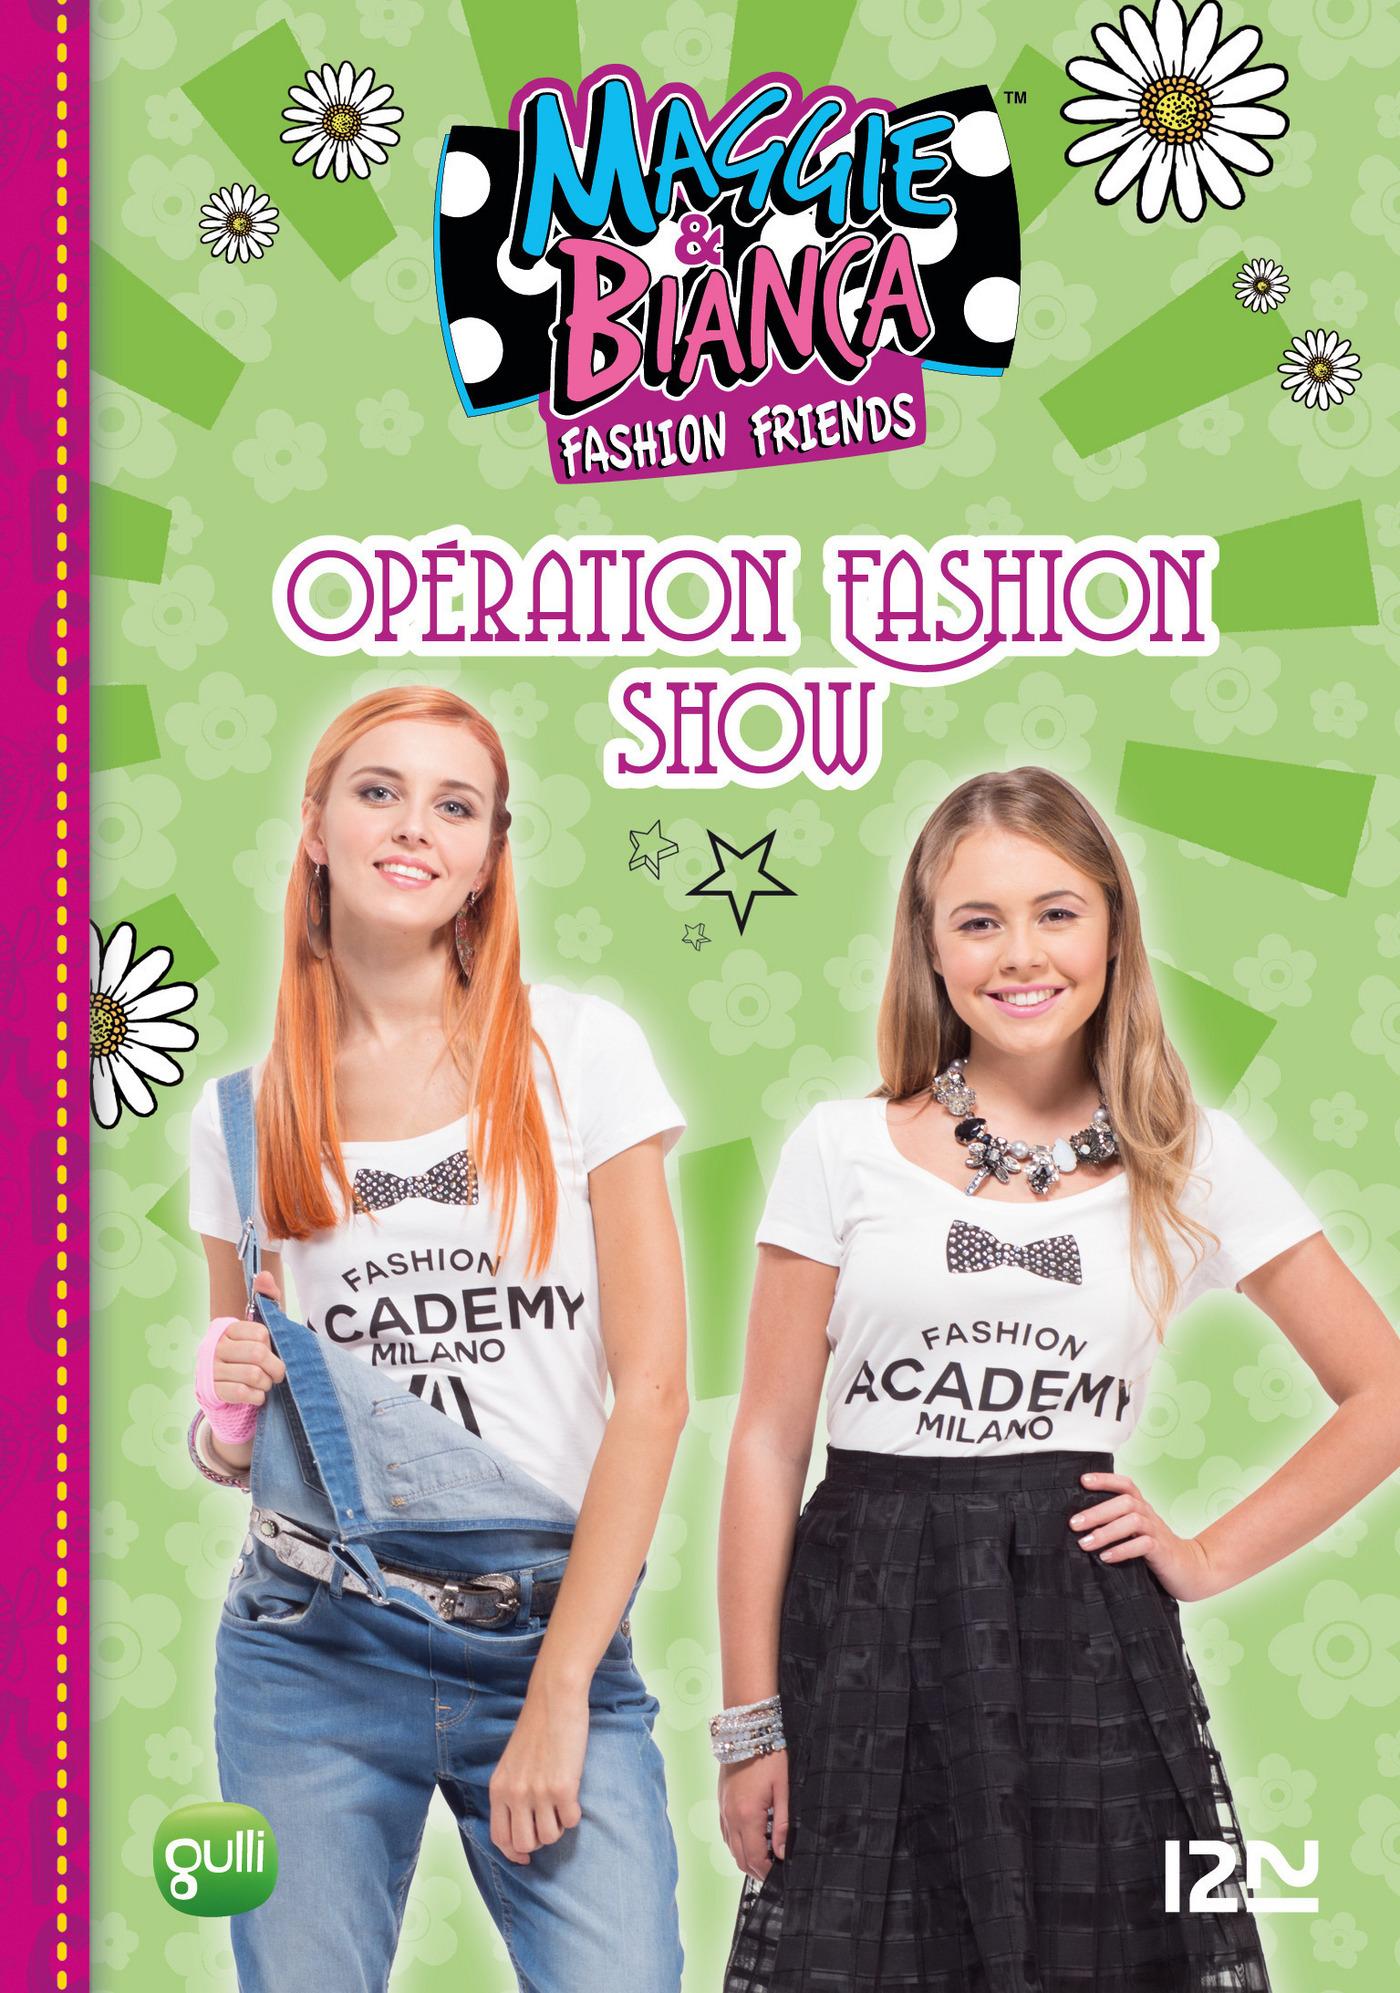 Maggie & Bianca - tome 8 : Opération Fashion Show